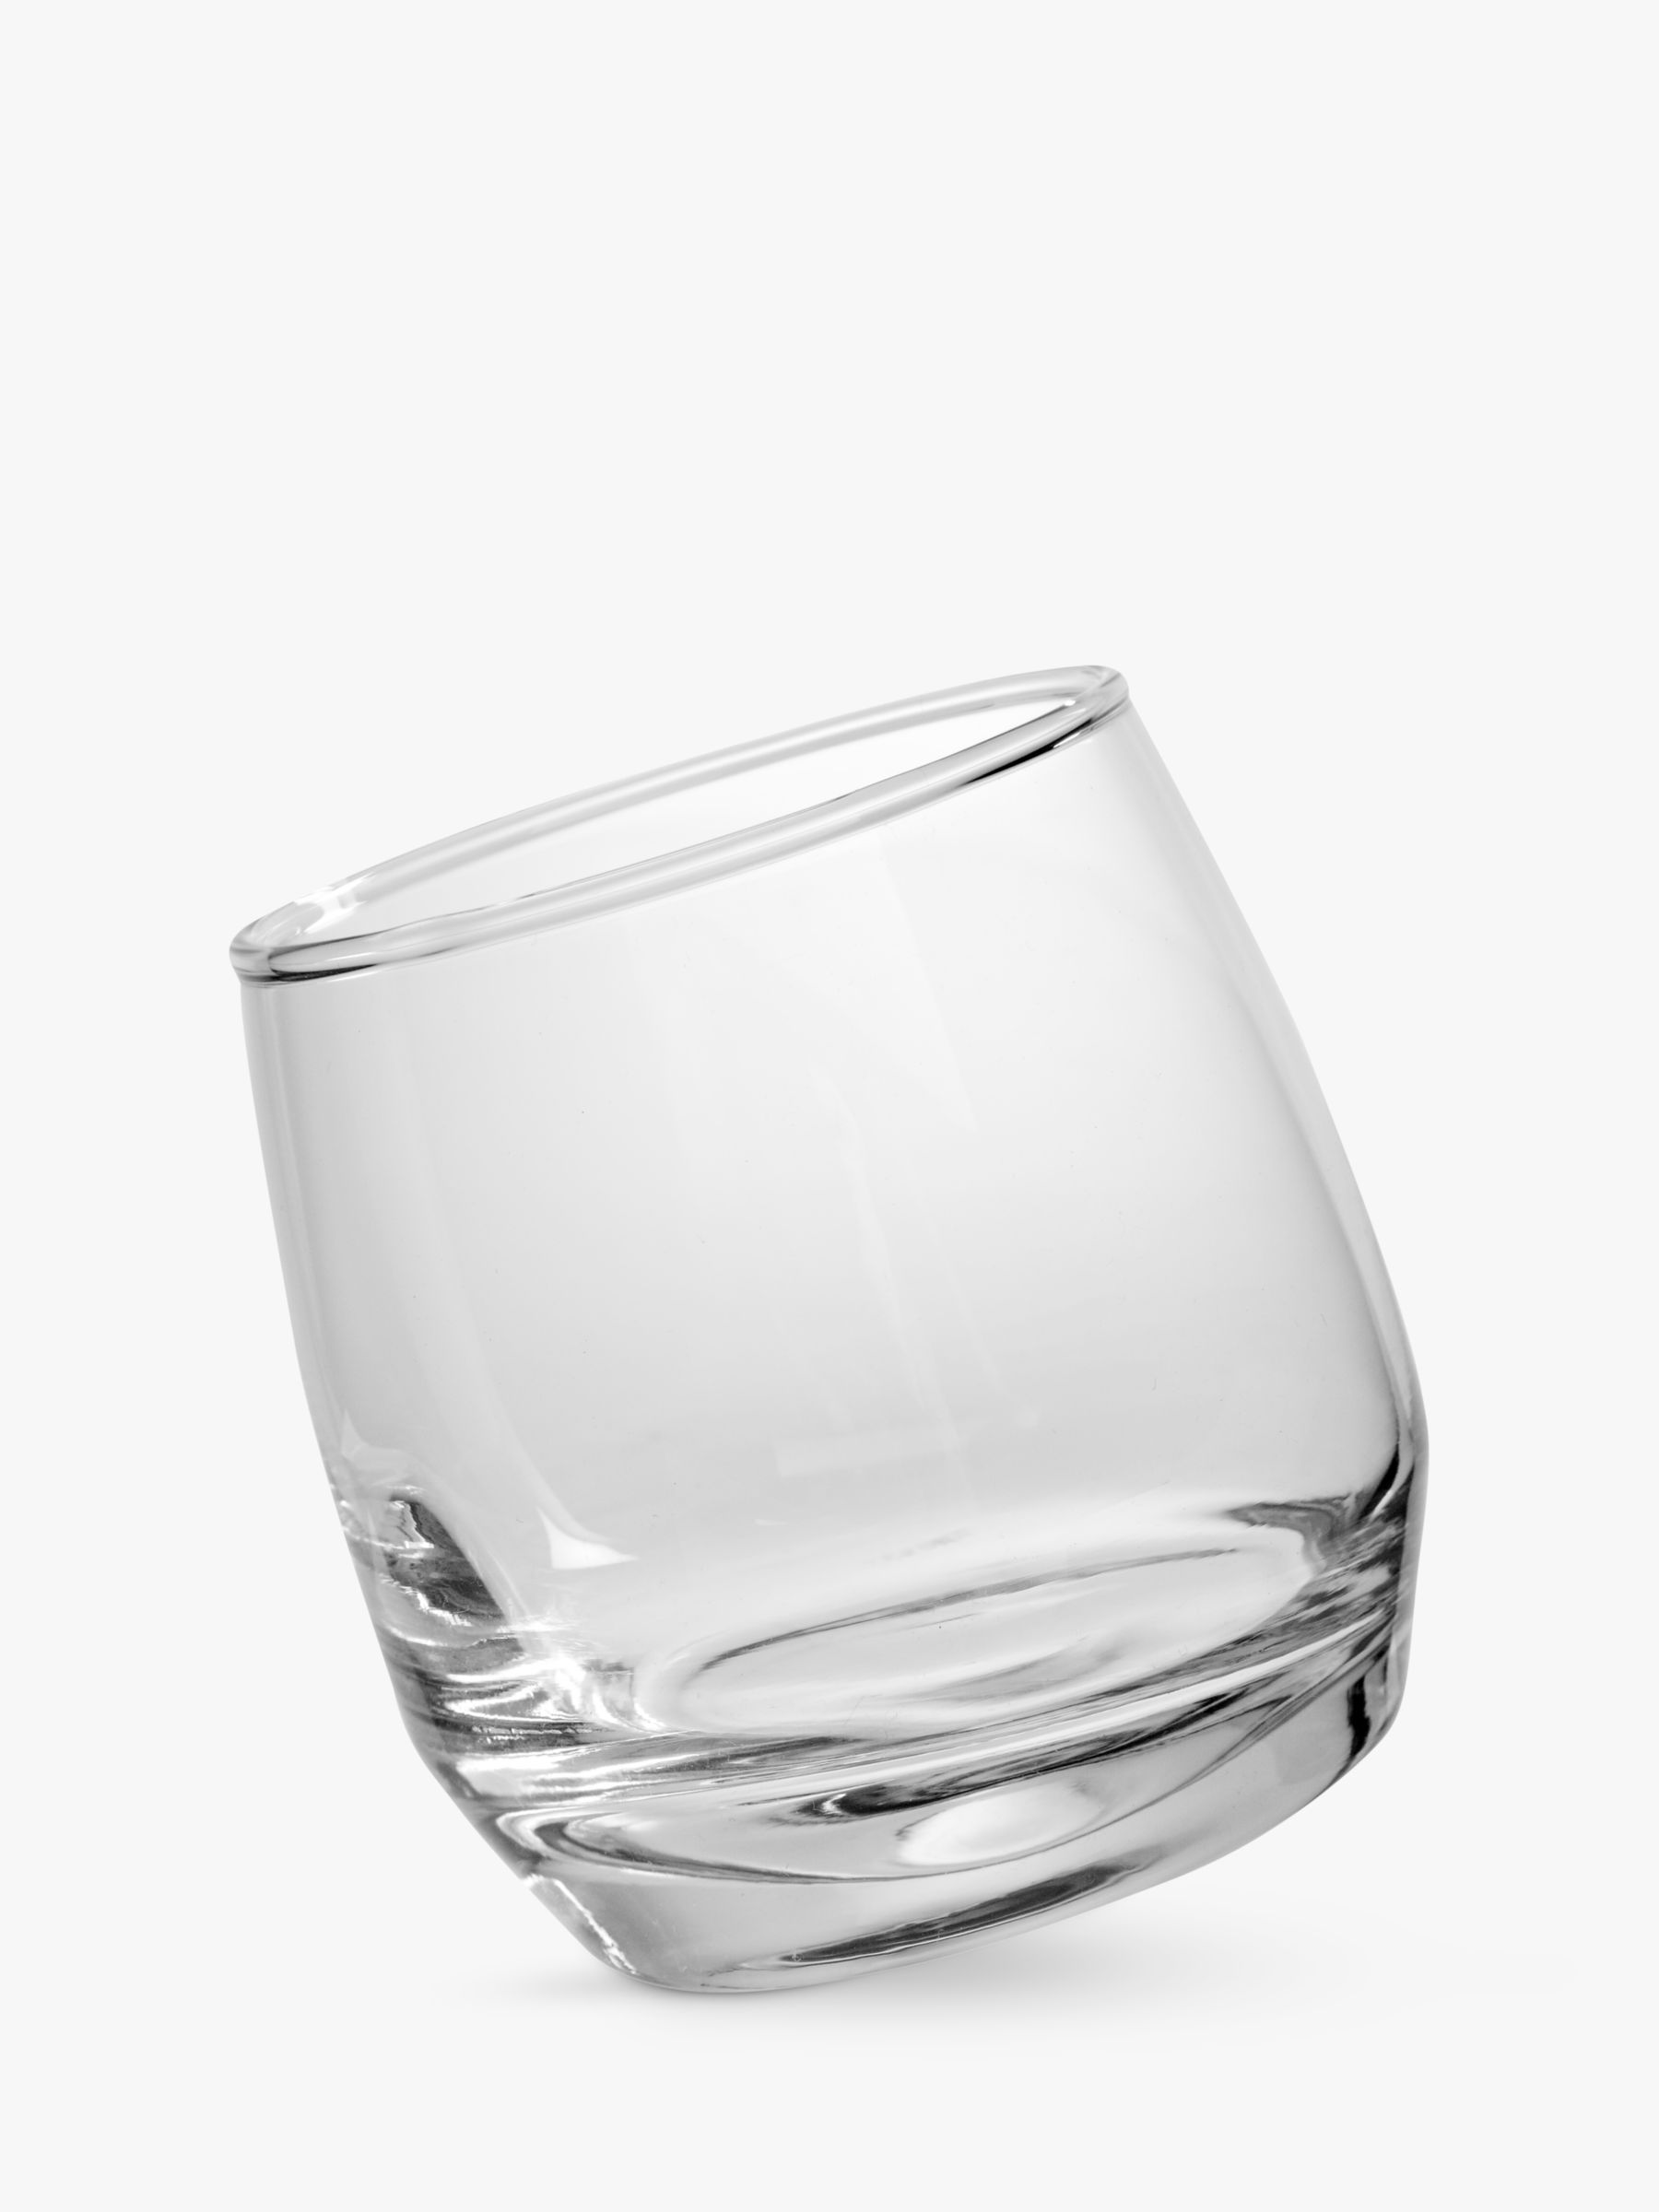 Sagaform Sagaform Round Bottom Whisky Glasses, Set of 6, Clear